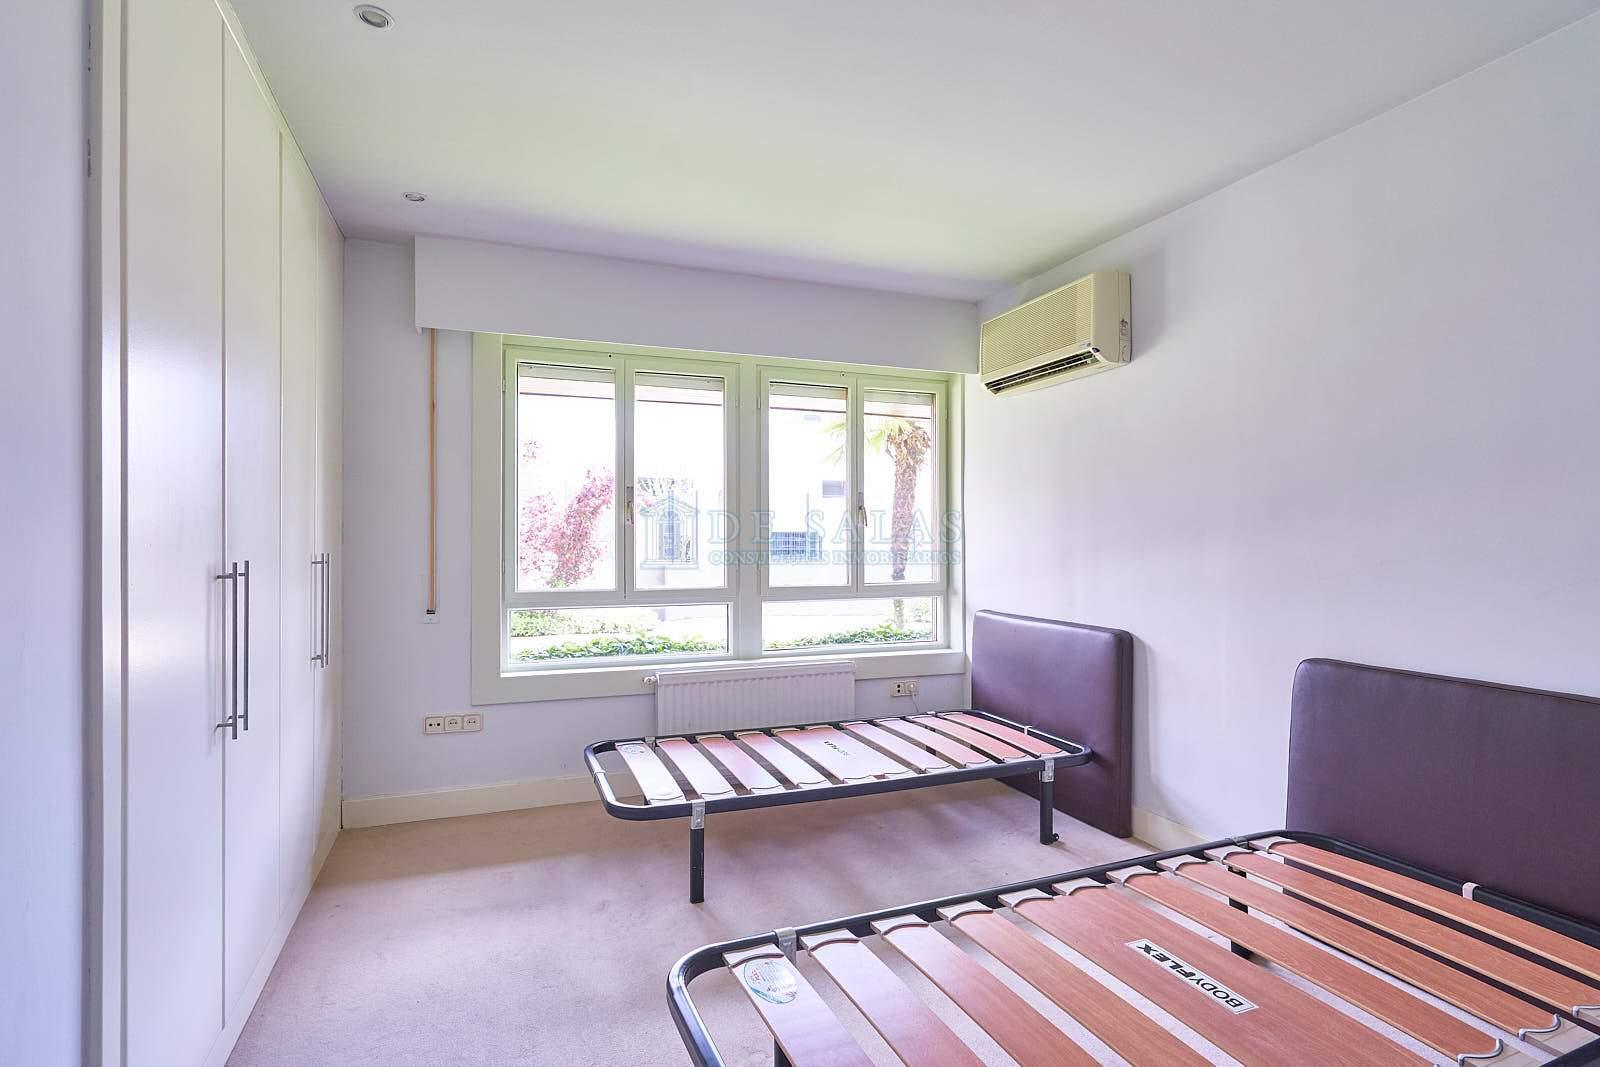 Dormitorio-031 Chalet La Moraleja